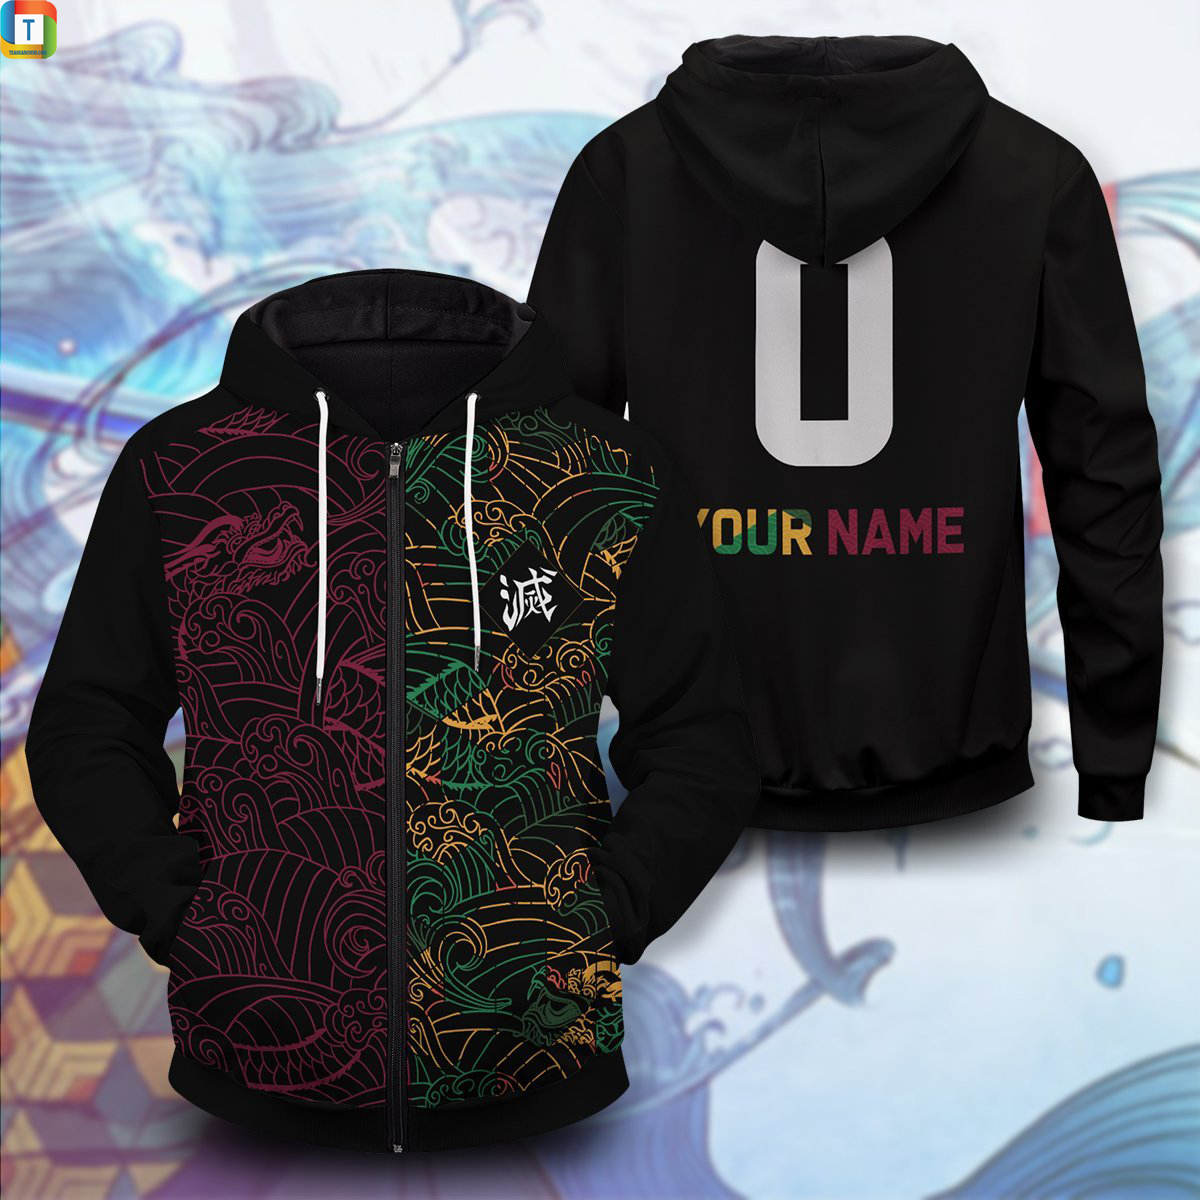 Personalized tomioka giyu unisex zipped hoodie